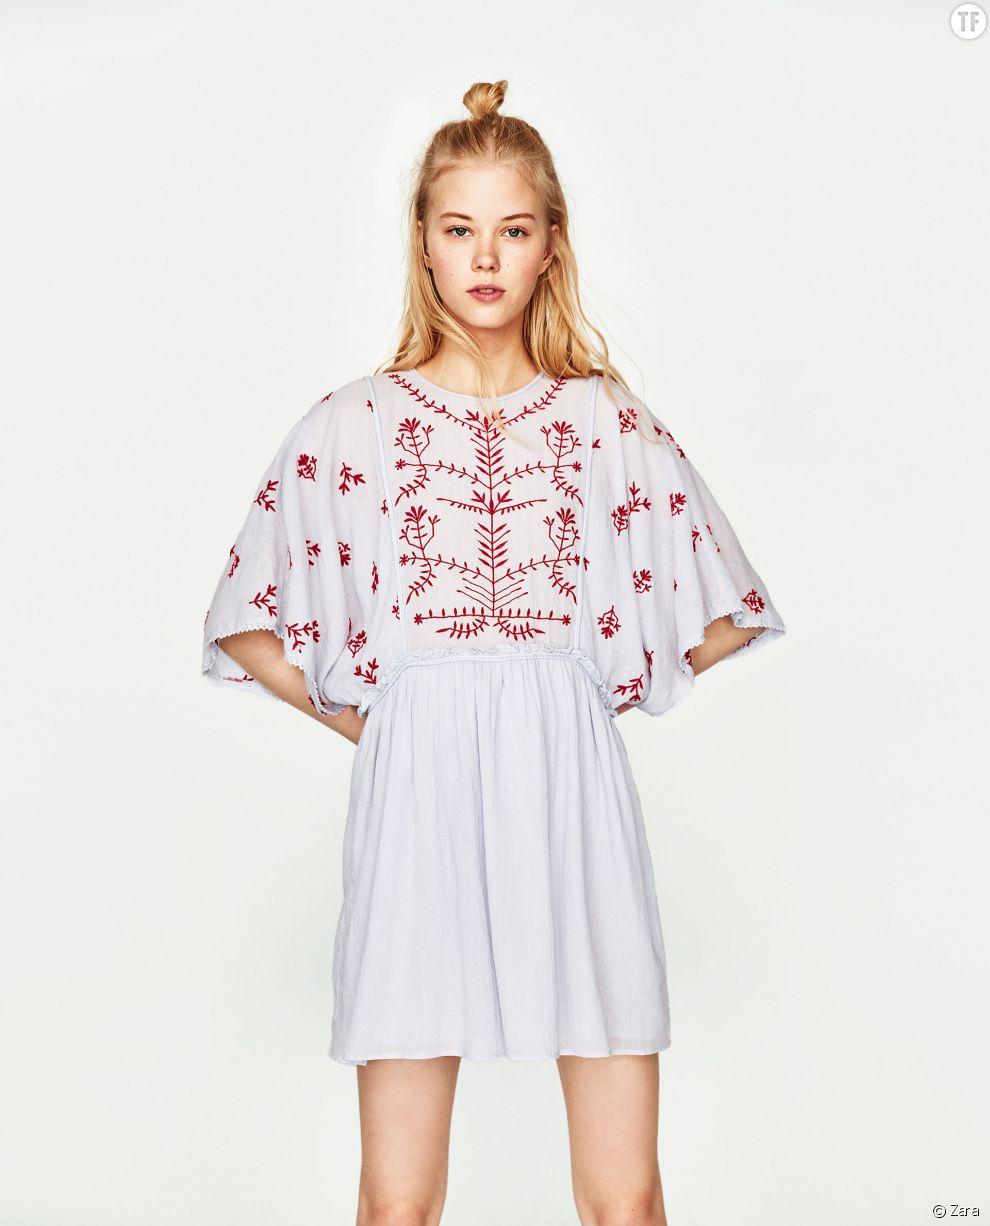 Robe à détails brodés Zara, 25,99€